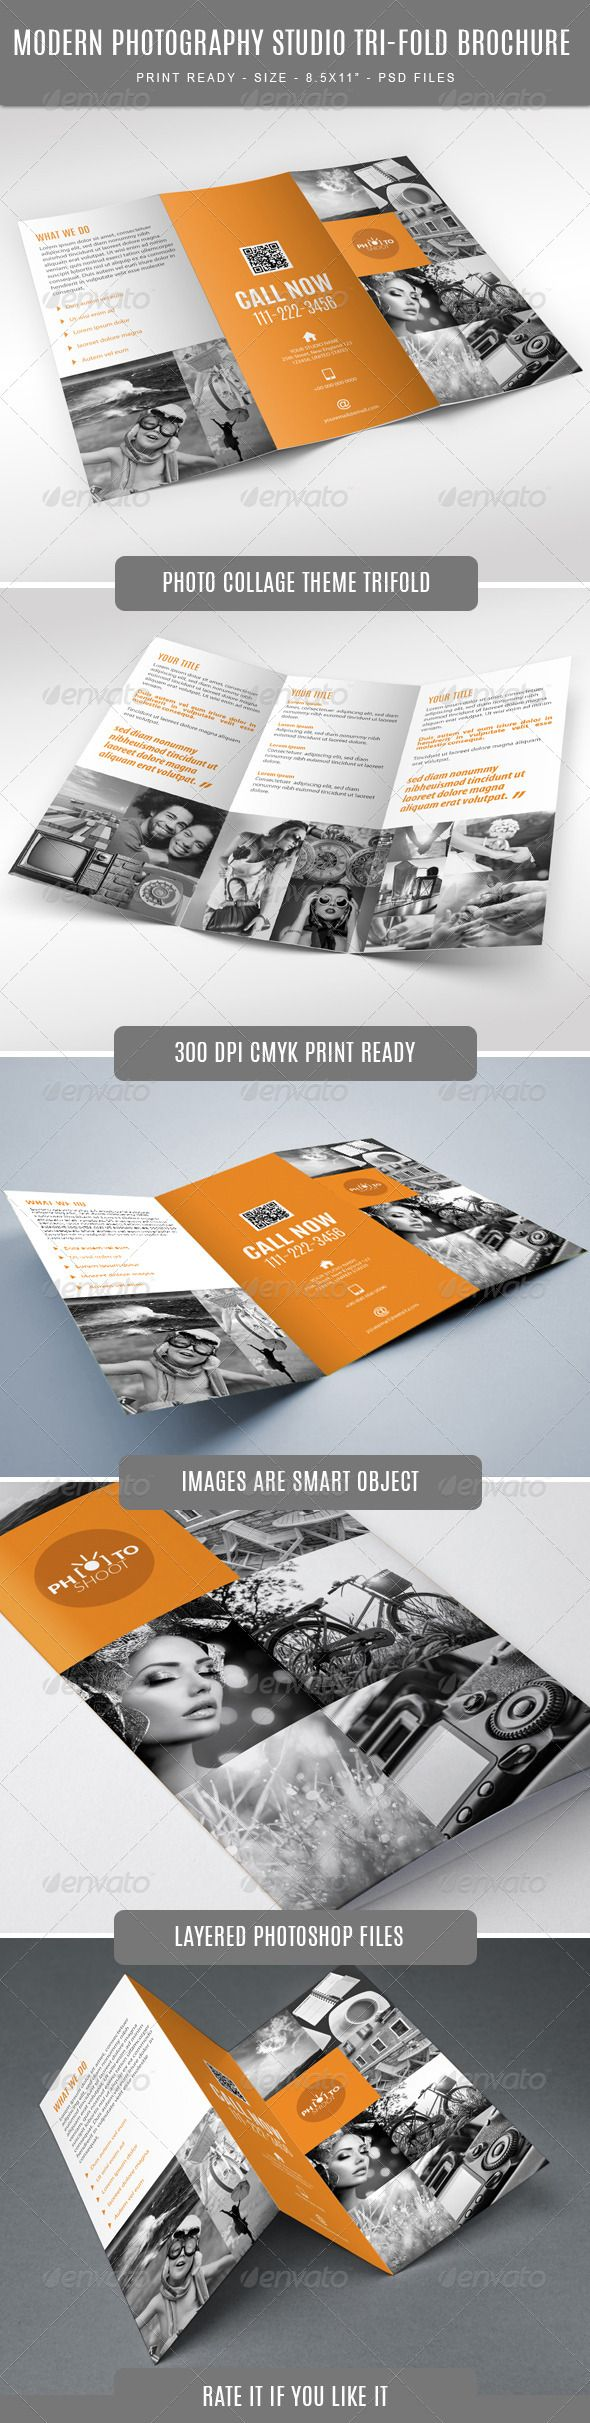 Photography Studio Tri-Fold  —  PSD Template